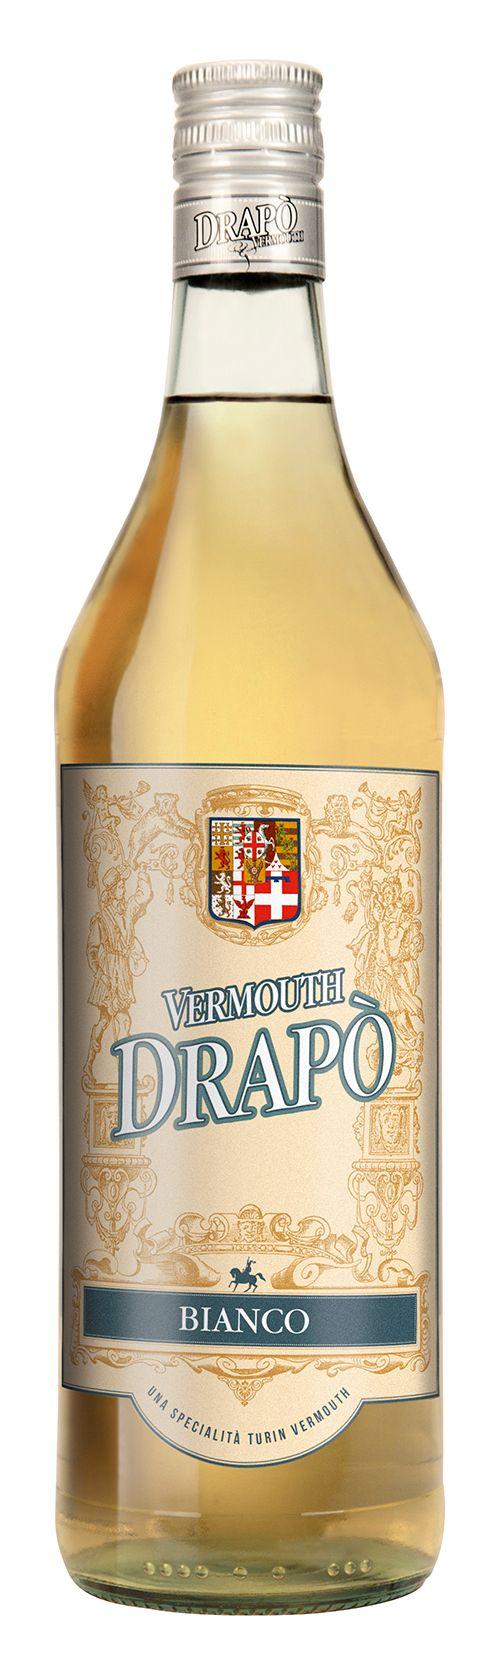 Drapo Bianco Vermouth